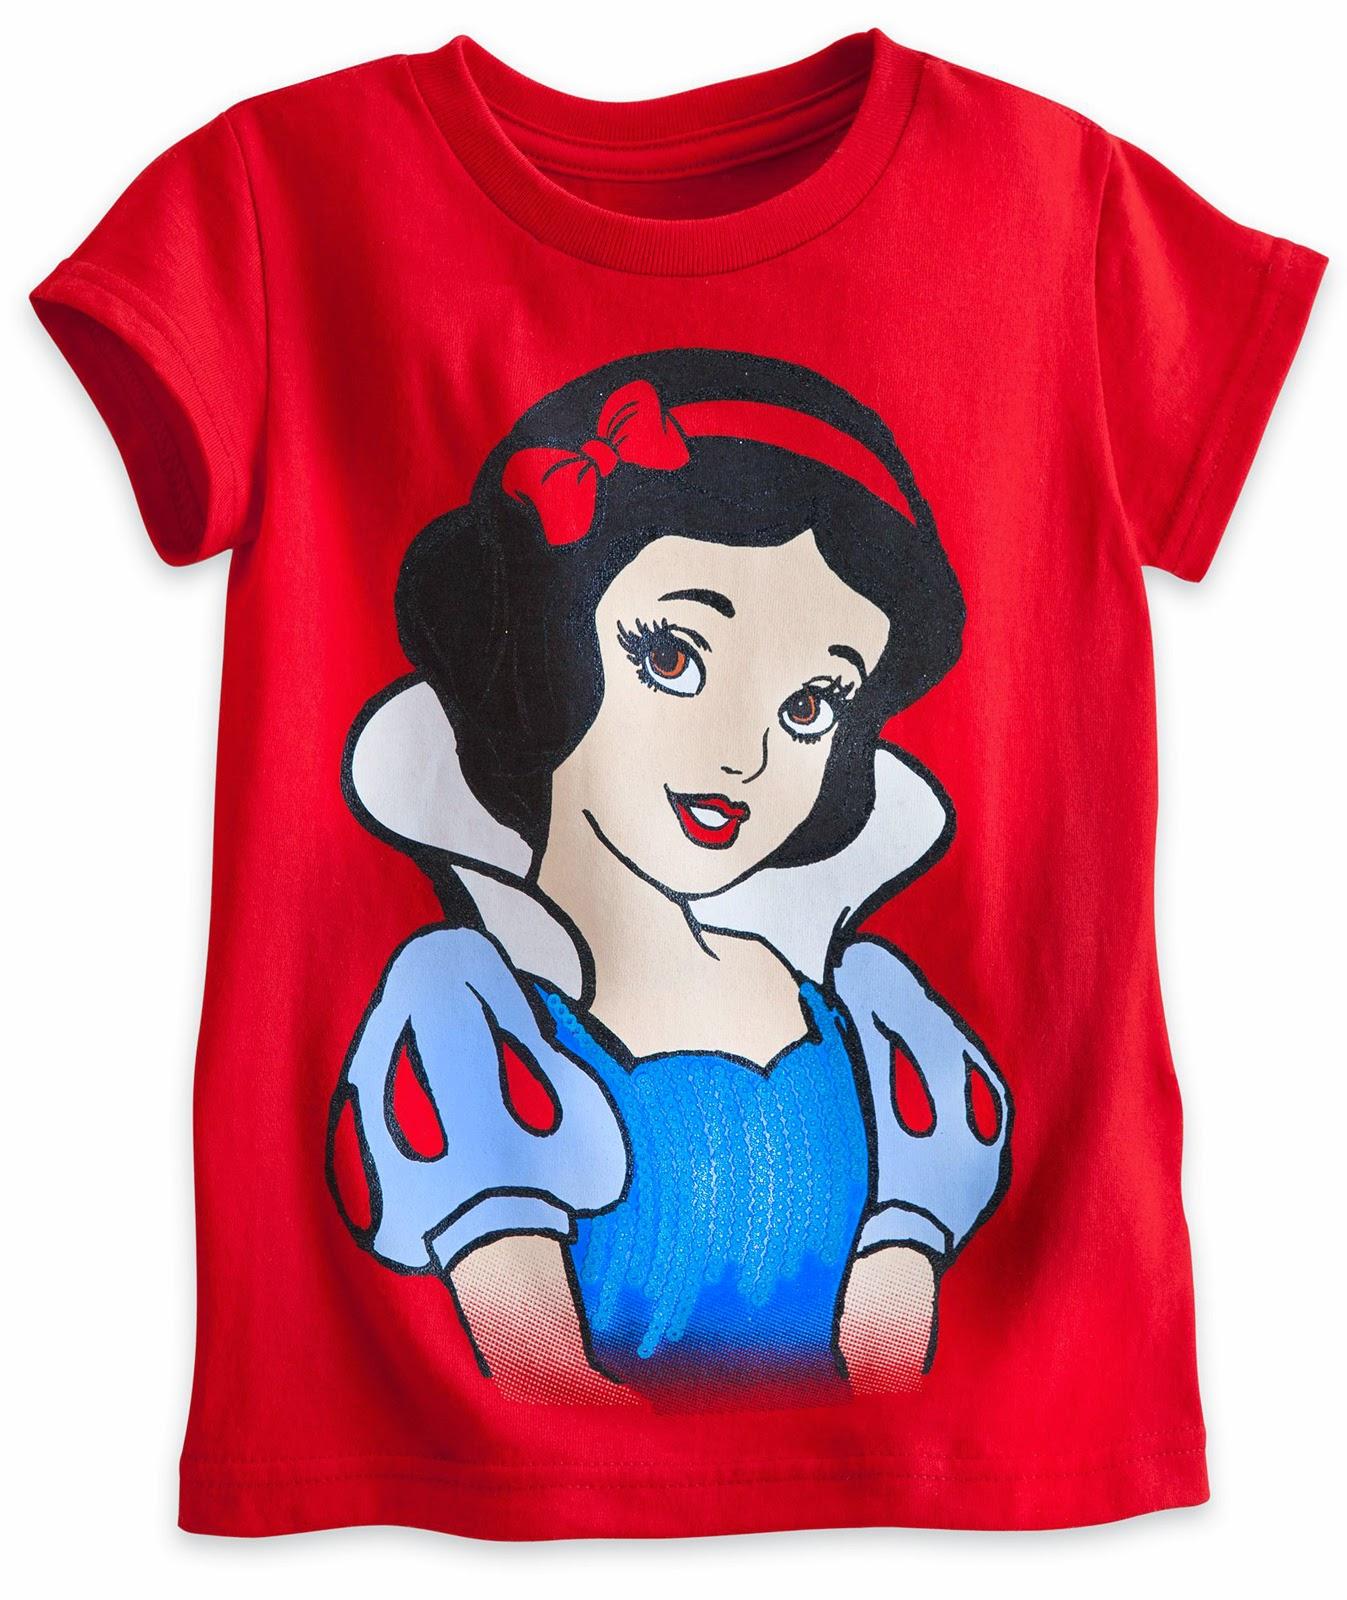 f9c310827d Filmic Light - Snow White Archive  2014-15 Snow White Children s ...